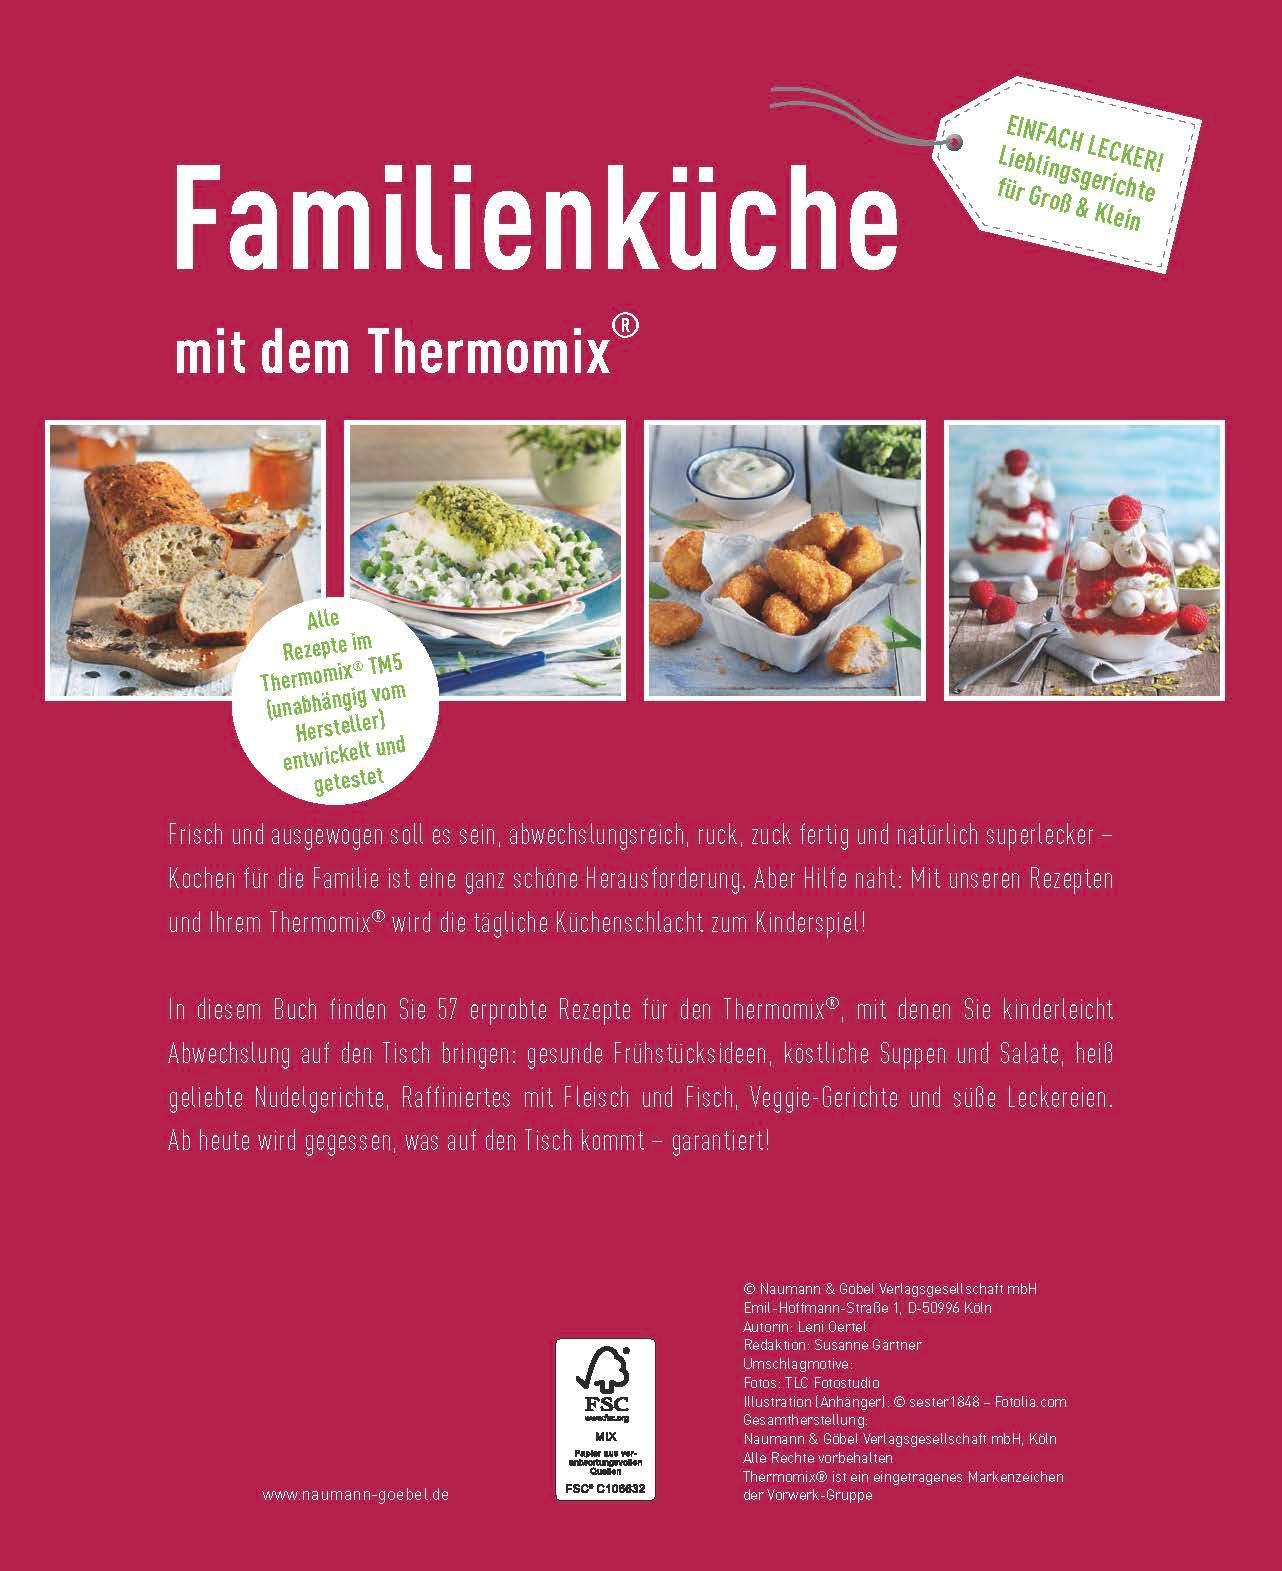 Familienküche mit dem Thermomix: Amazon.de: Leni Oertel: Bücher